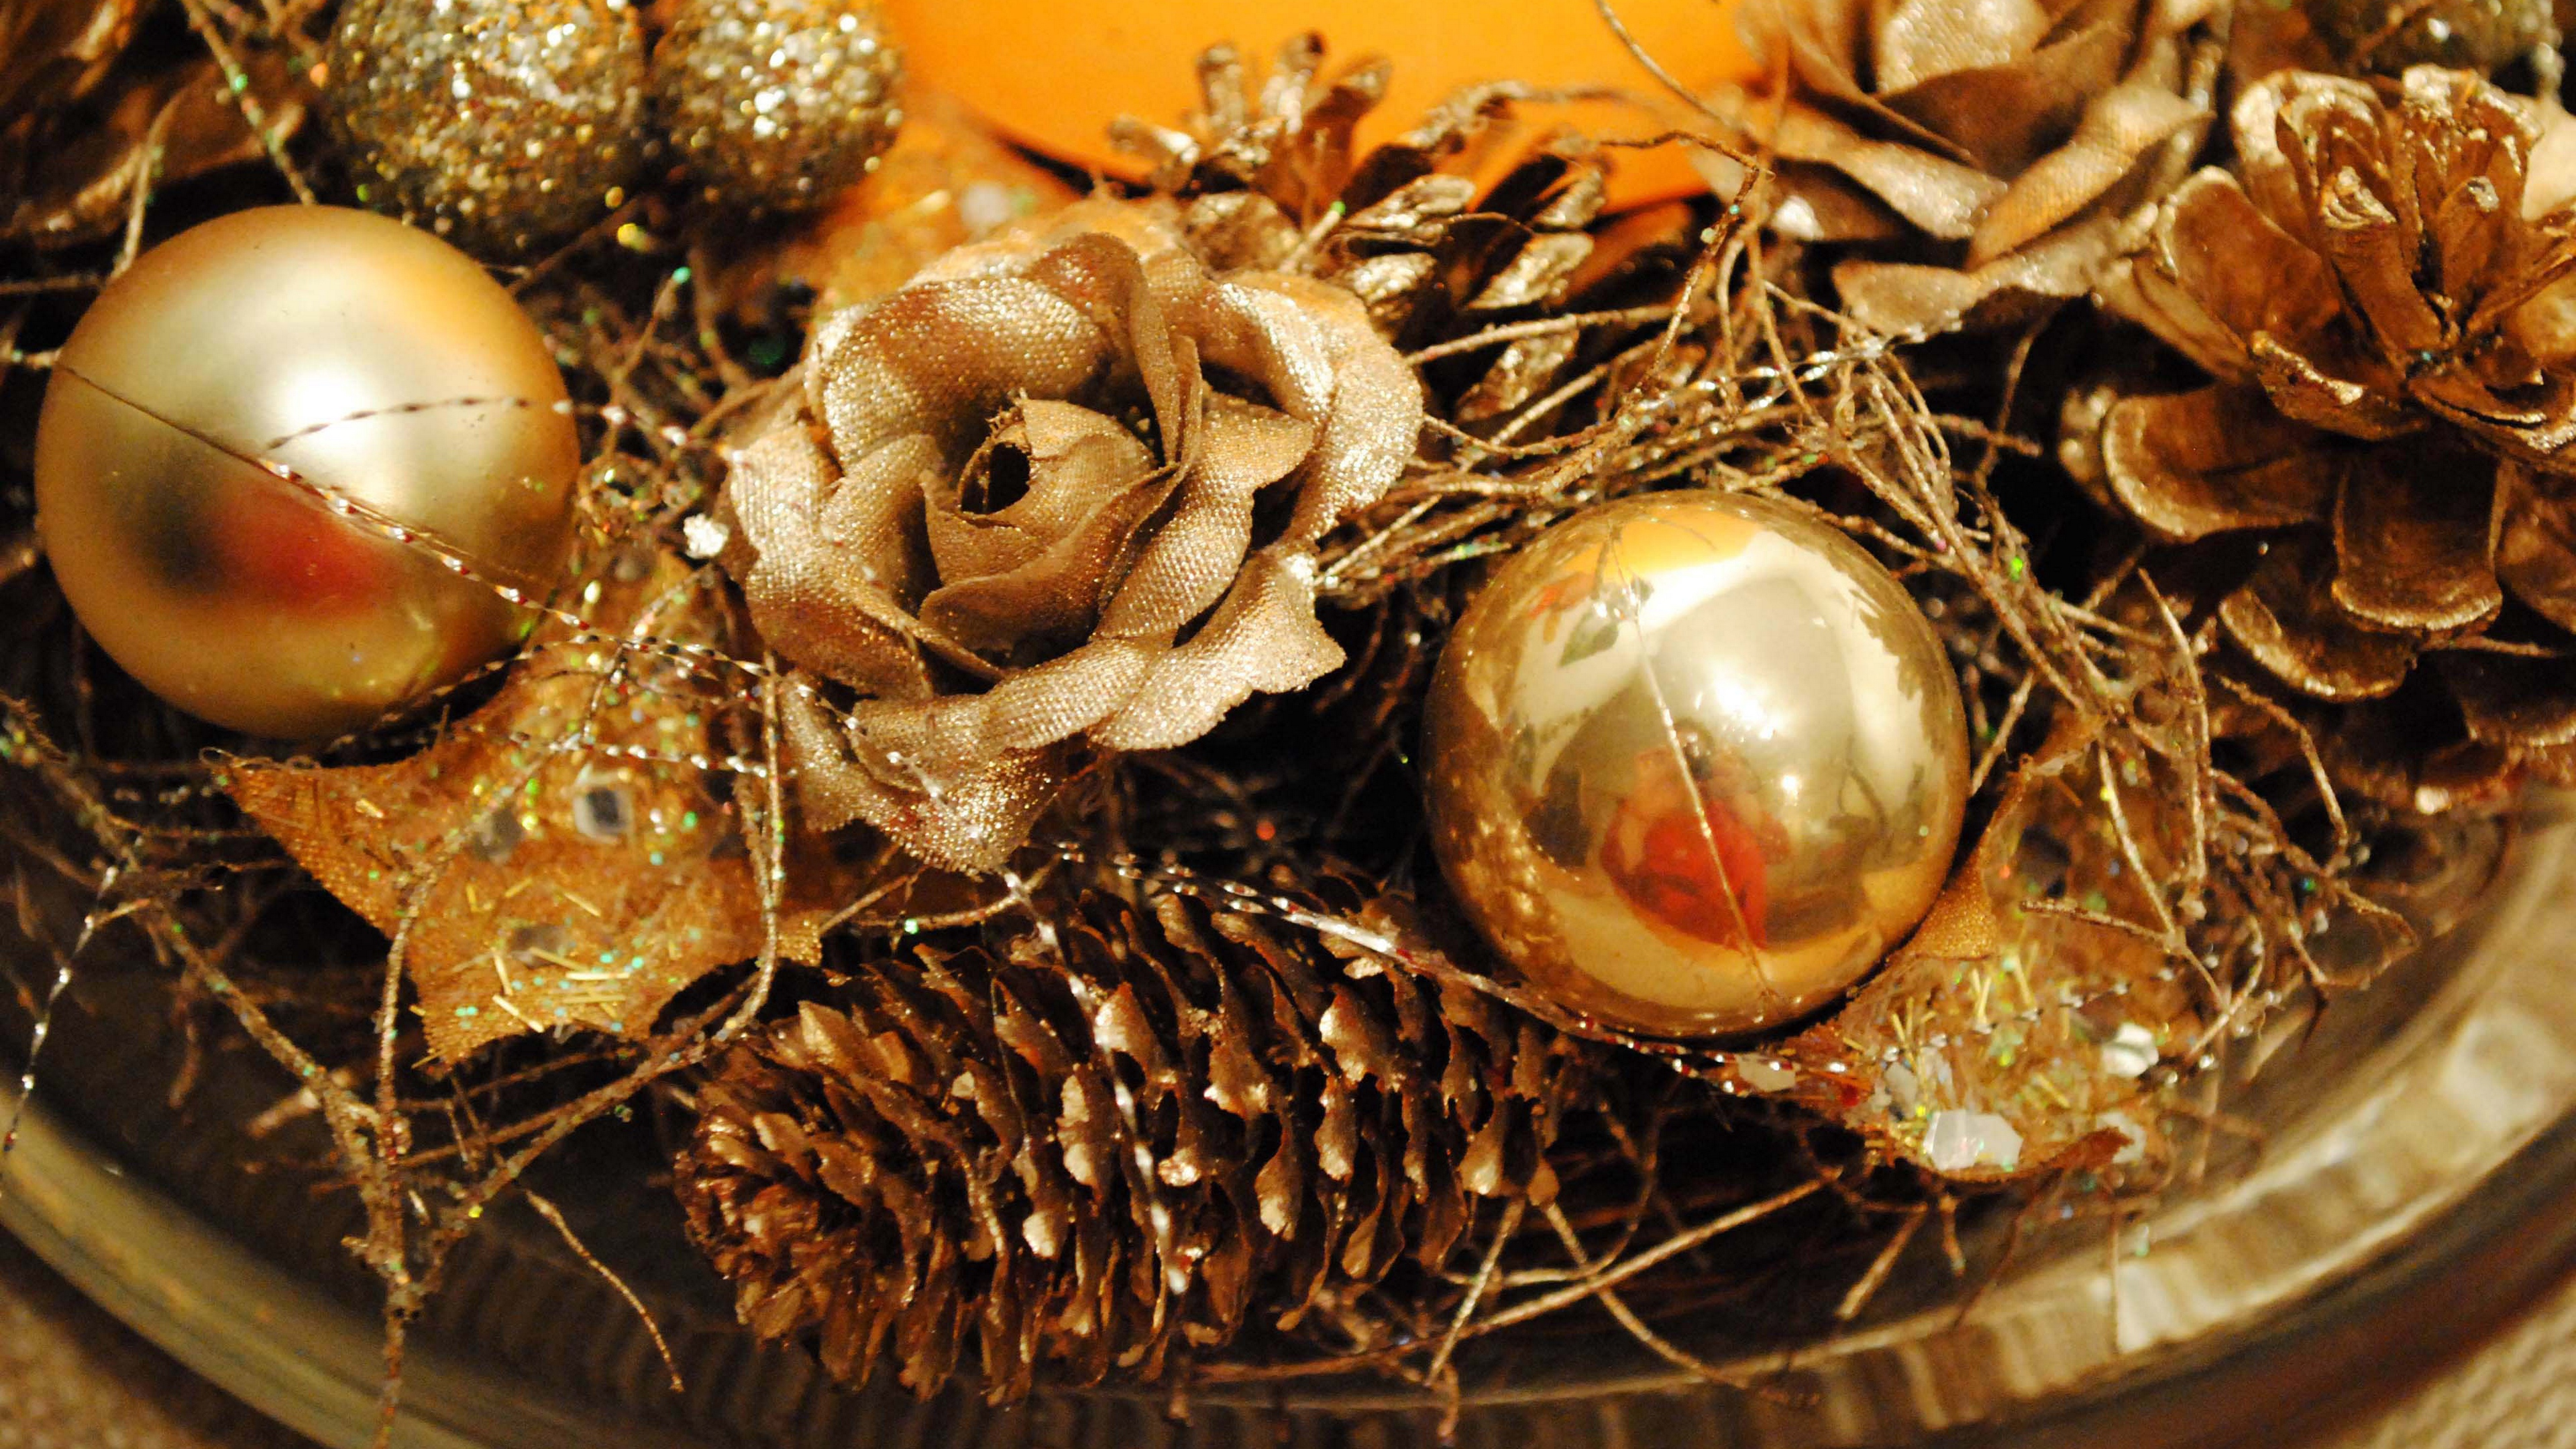 christmas candles decorations 4k 1538344558 - christmas, candles, decorations 4k - decorations, Christmas, Candles